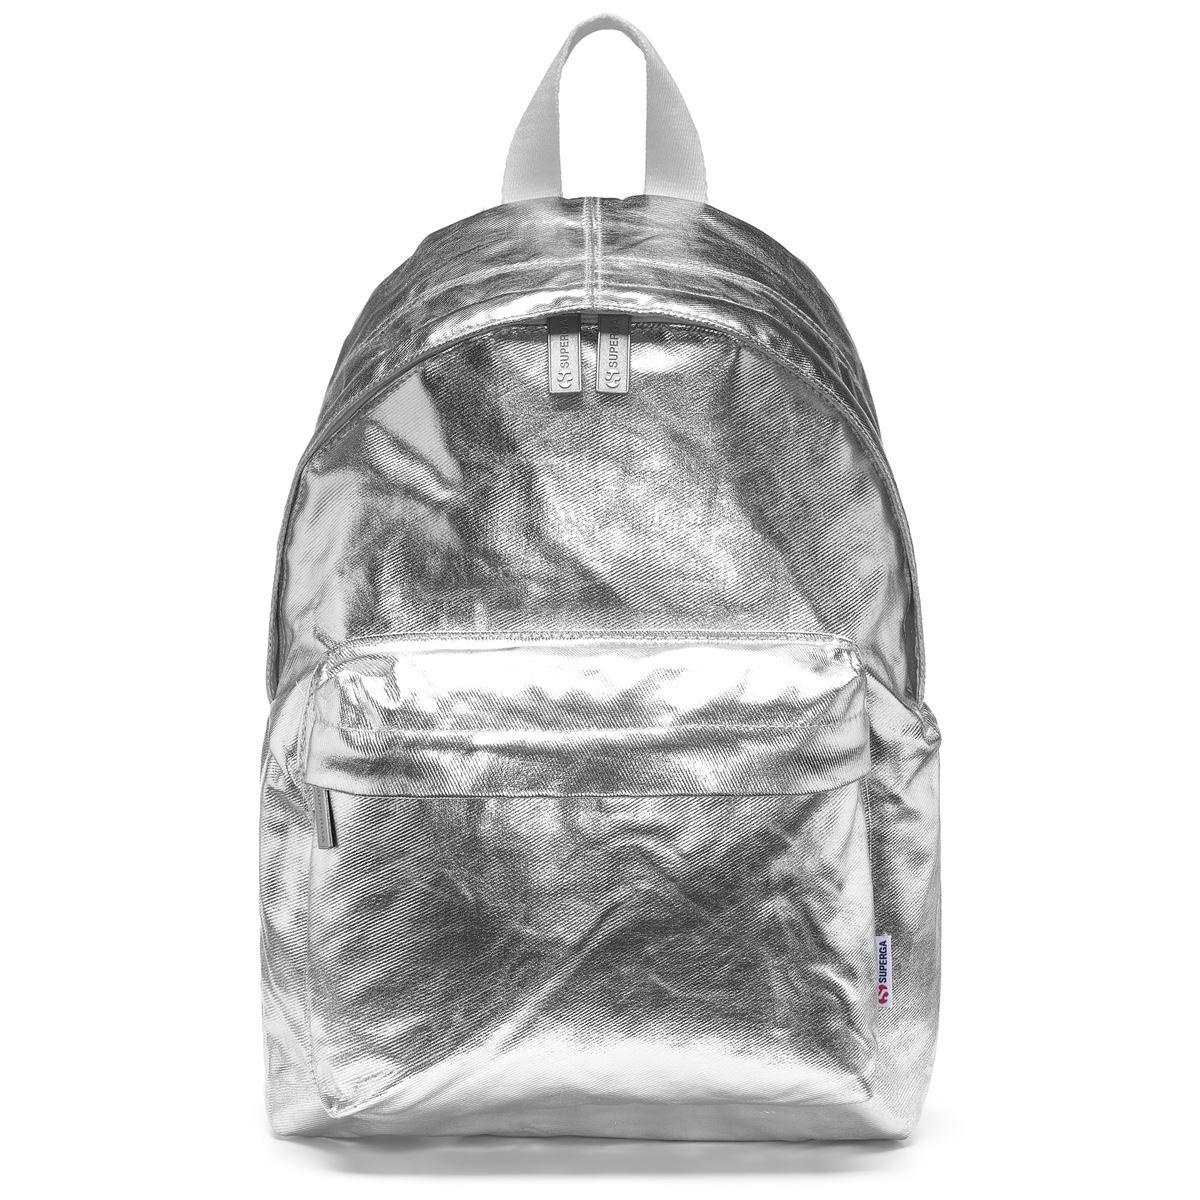 Italian Bags Superga for woman-S8112FW